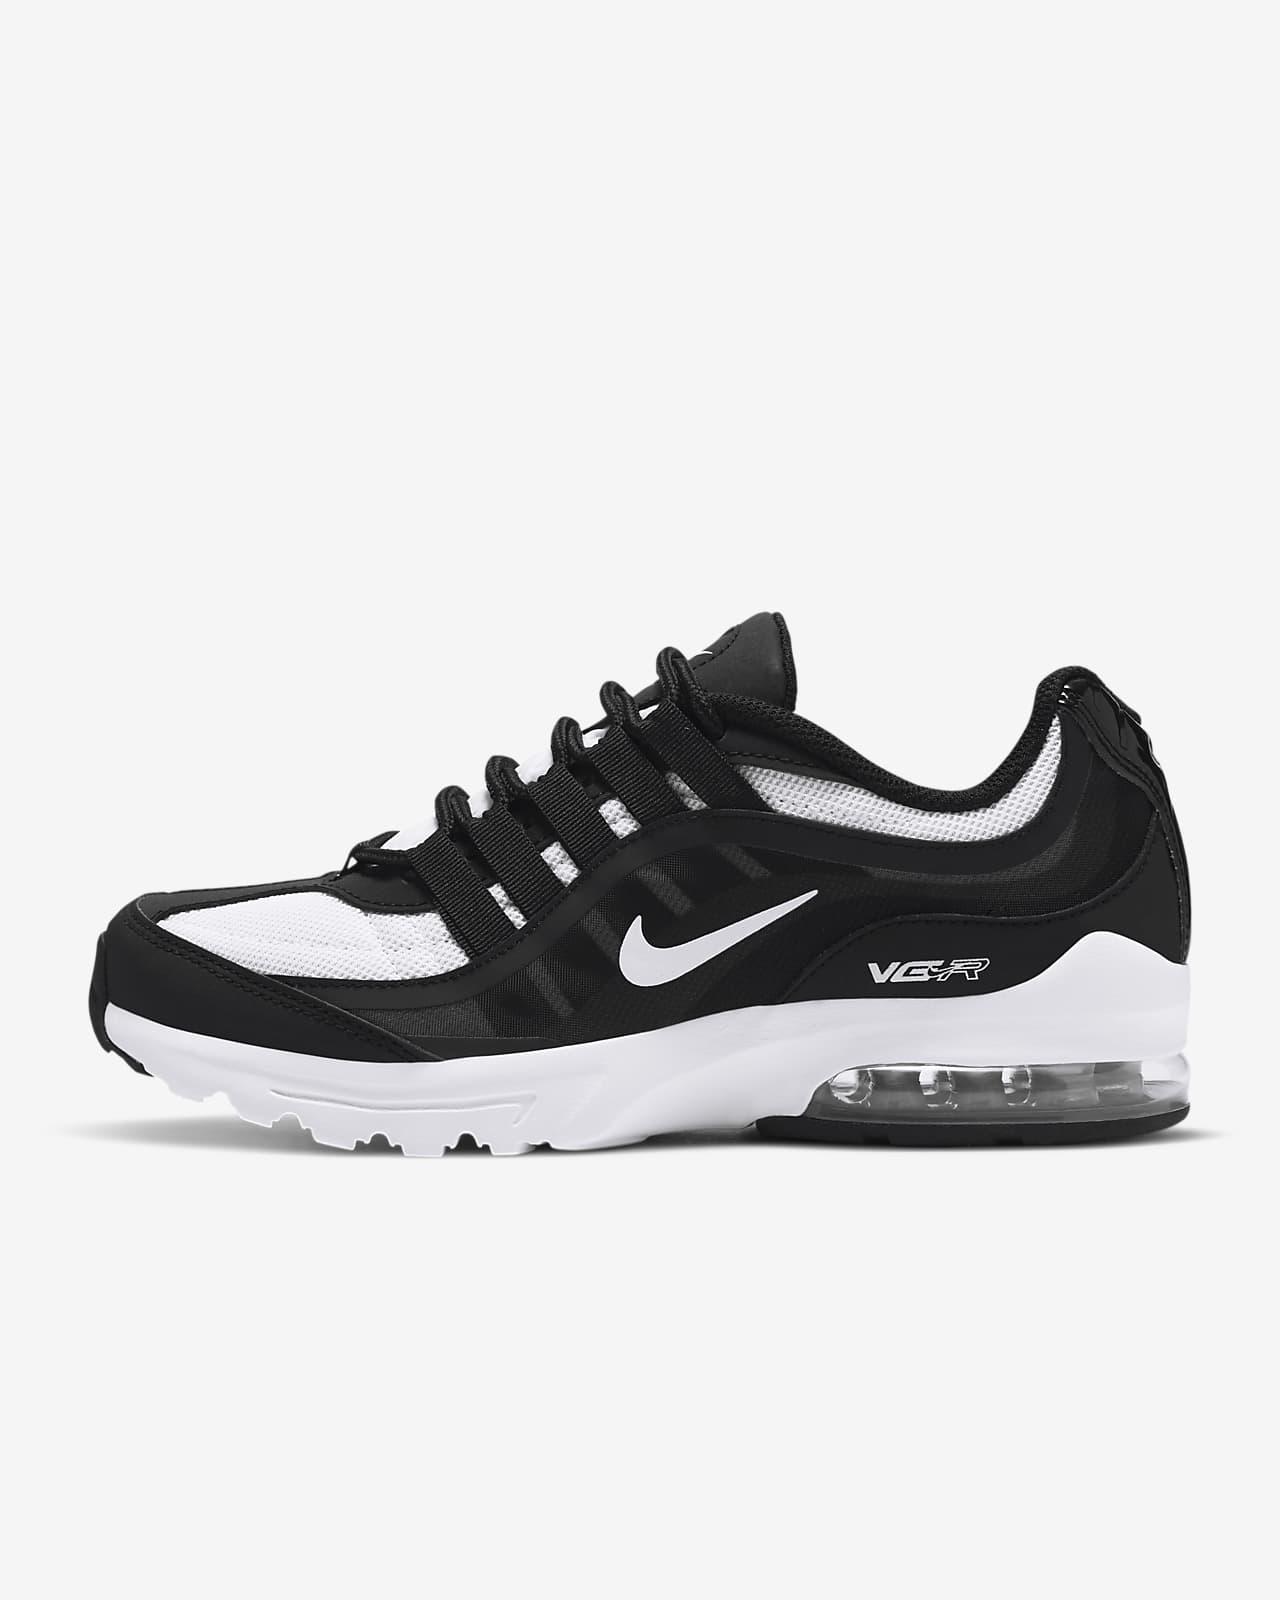 Nike Air Max VG-R Women's Shoe. Nike ID